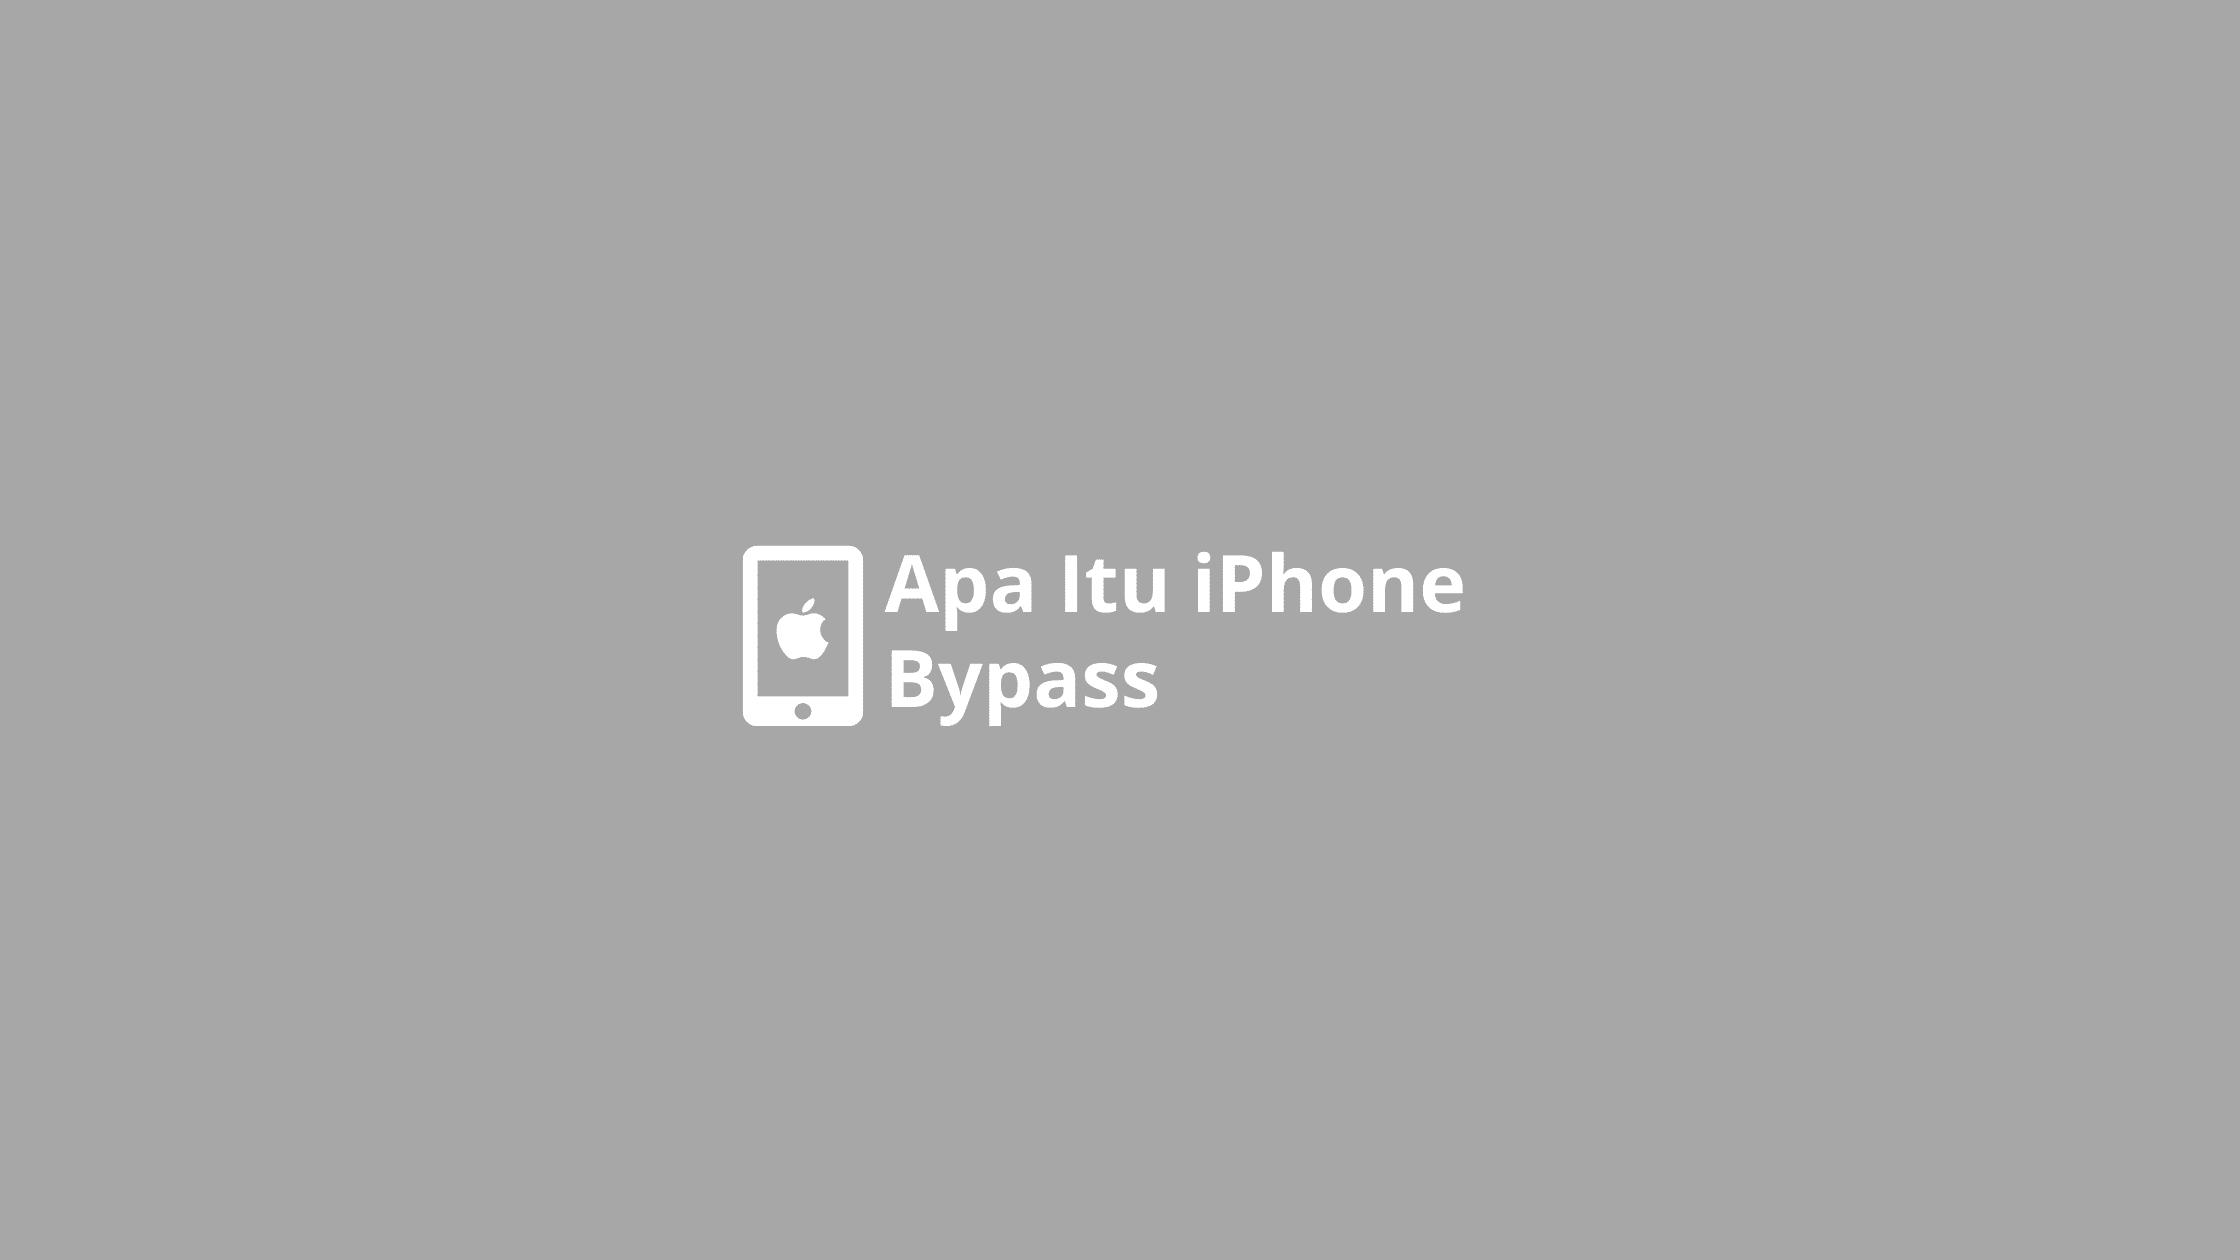 iphone bypass